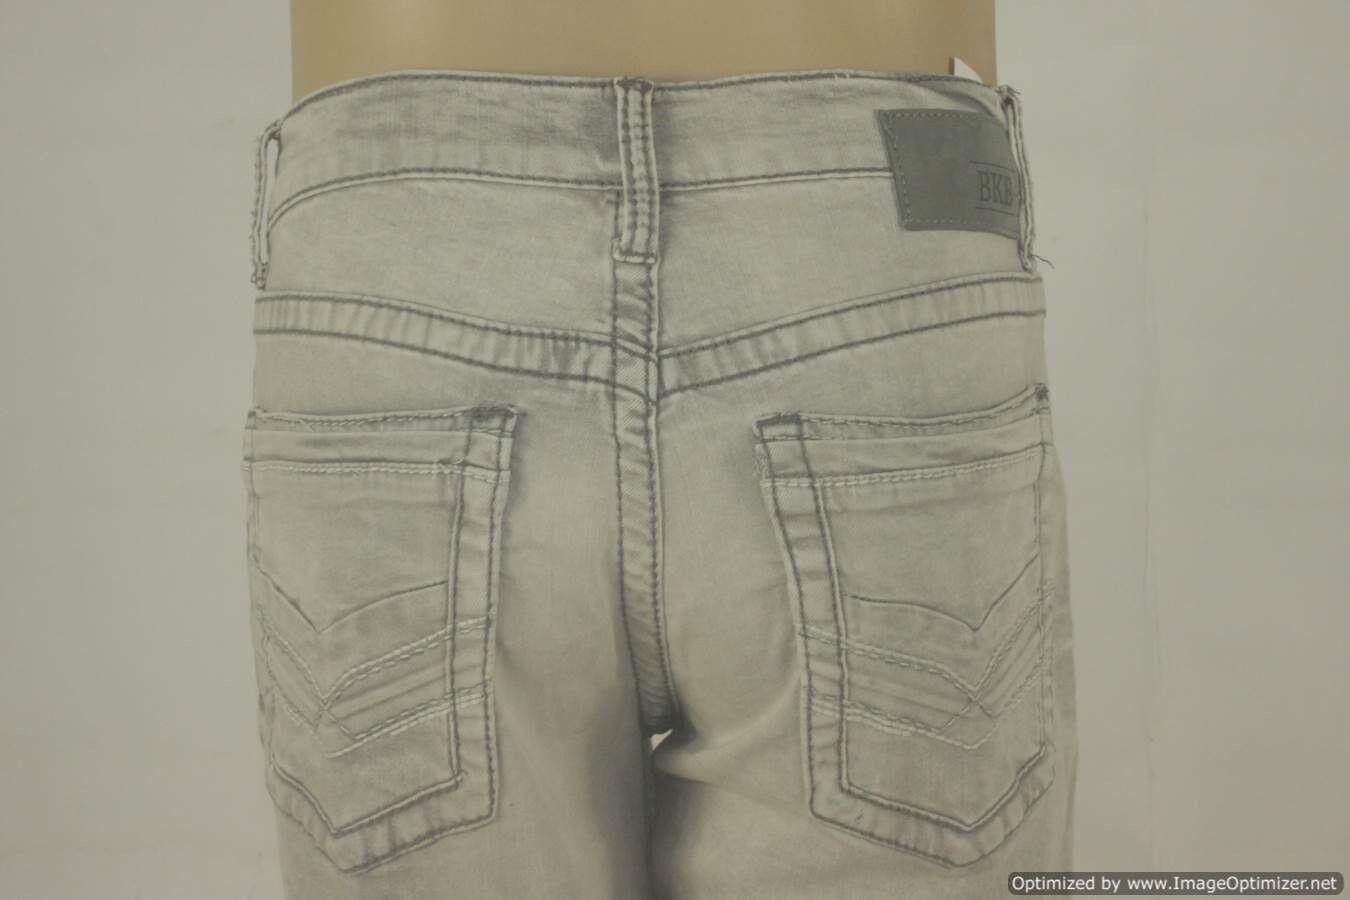 BKE Carter Low-Rise Bootcut Stretch Denim Jeans-Men's Size 33R - W  33 x L  31.5